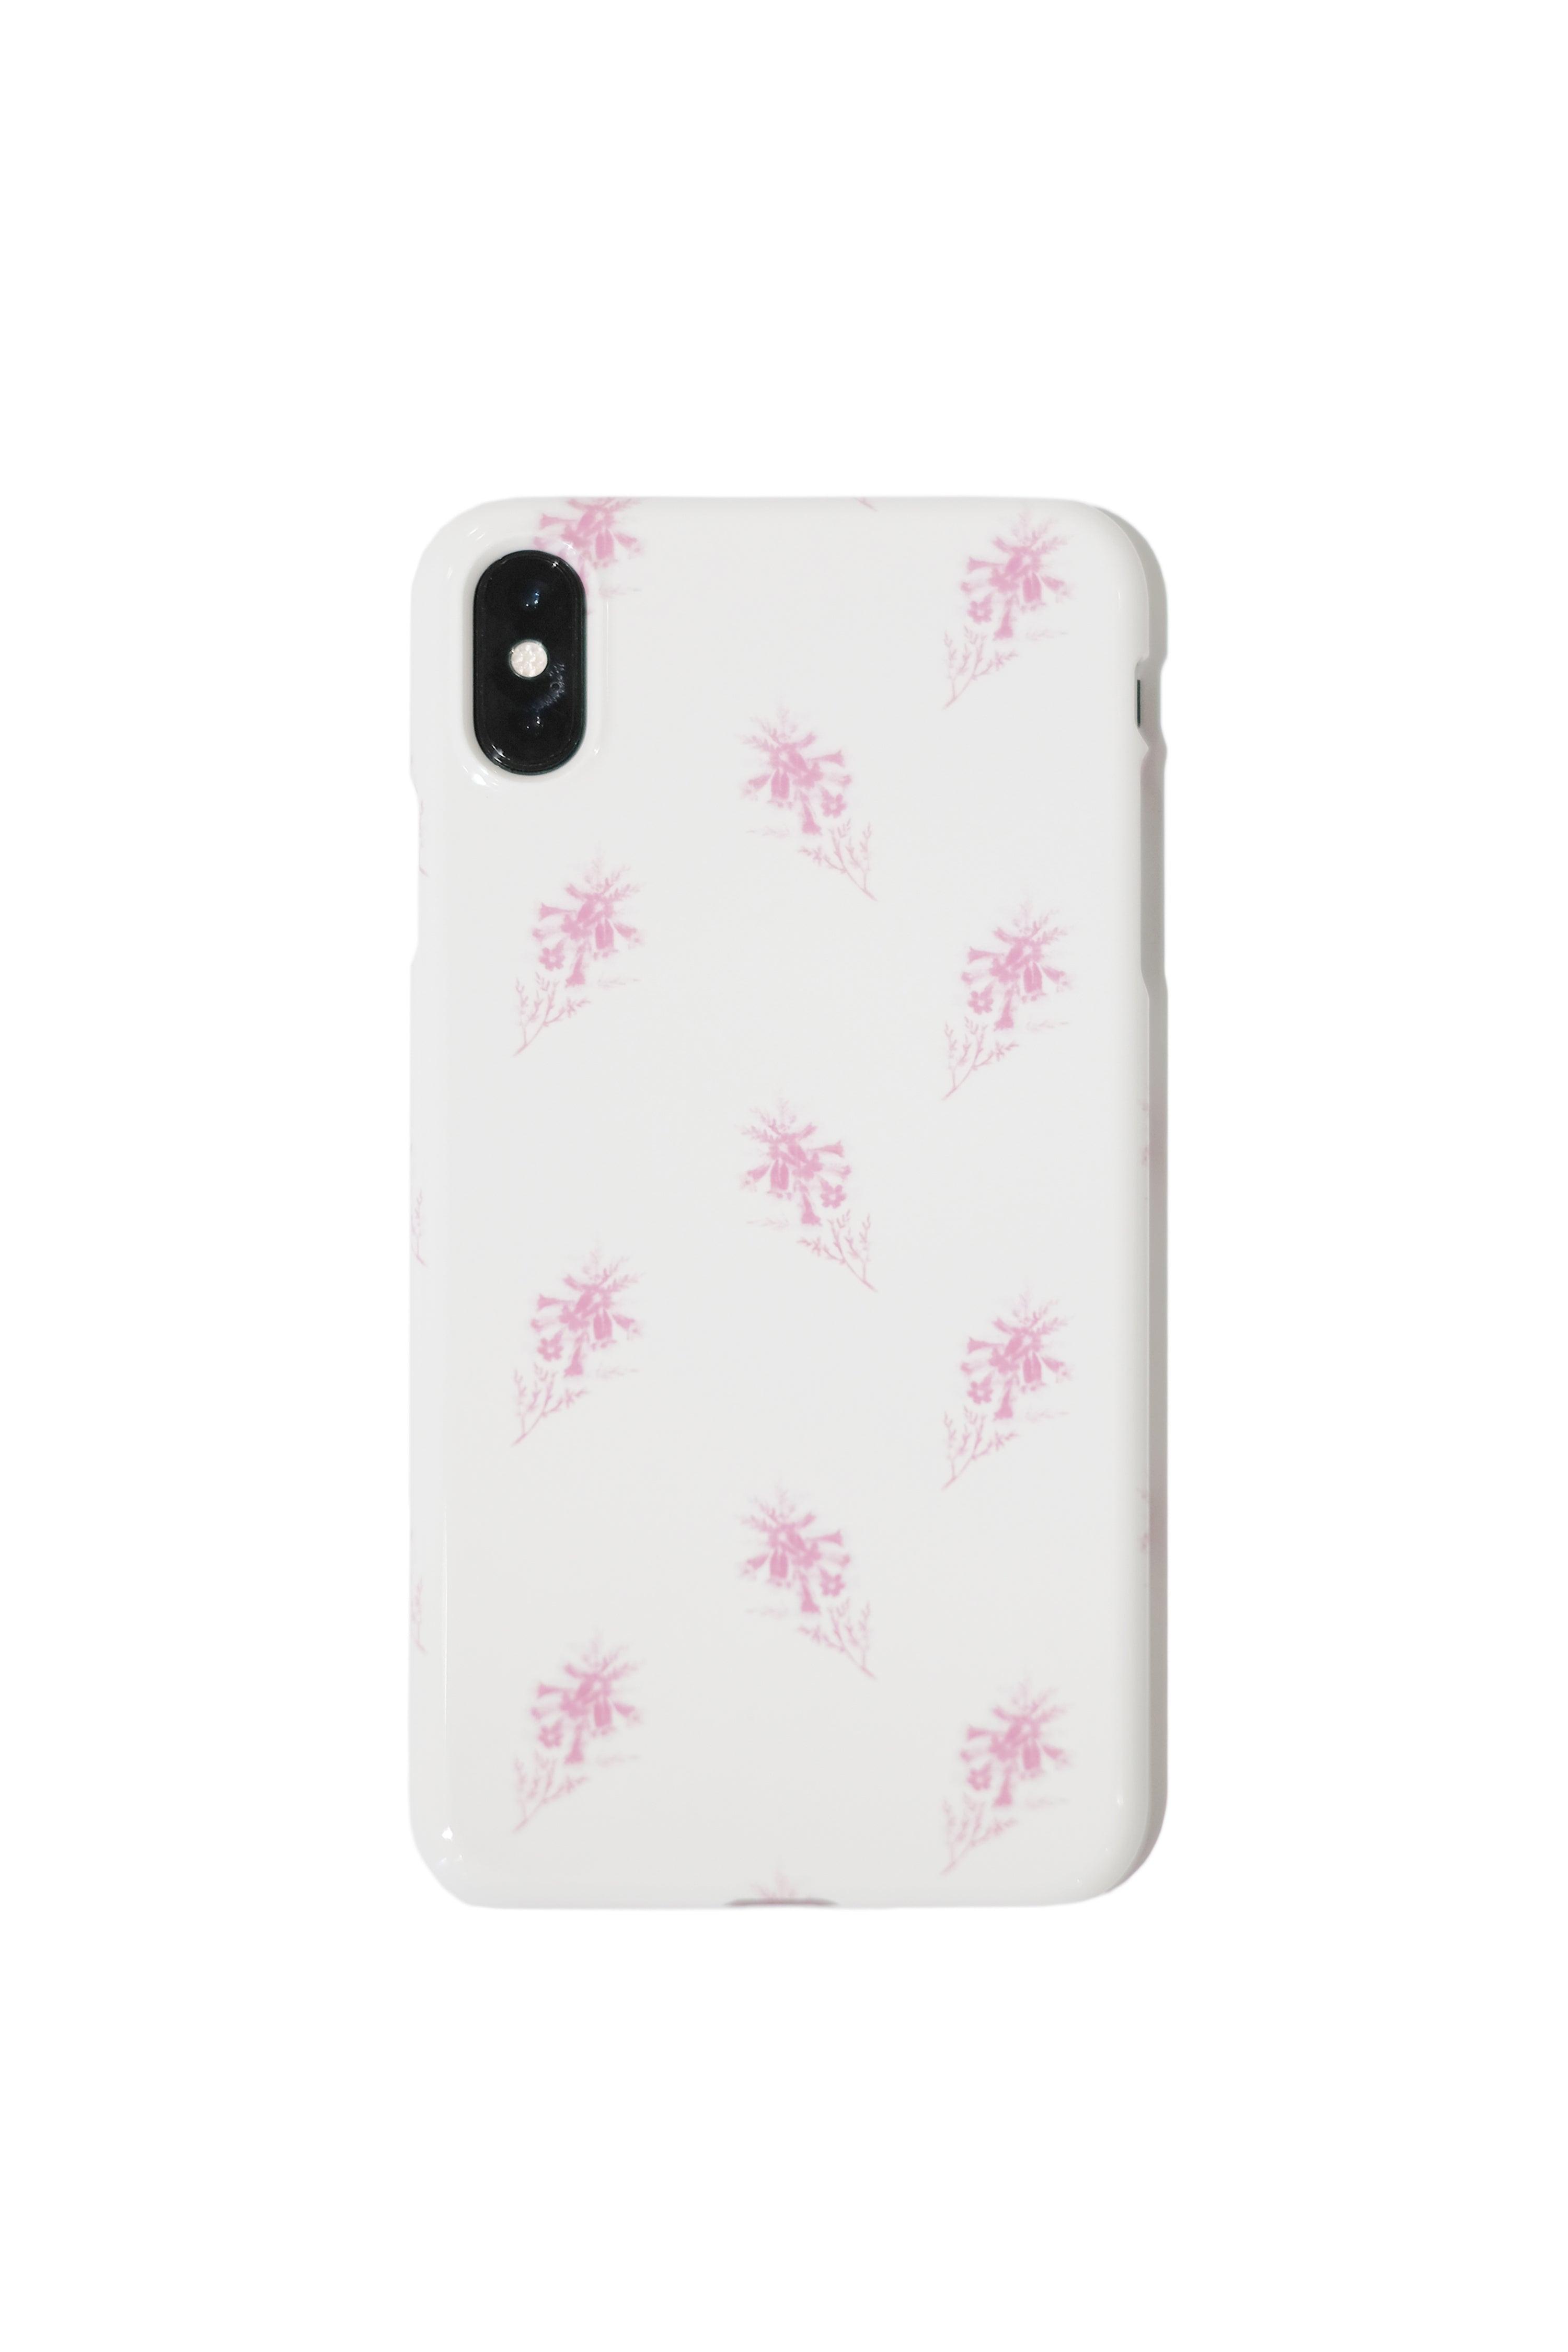 MINNIE AND EMMA Women's LoveShackFancy x Minnie and Emma iPhone Xs Max Case